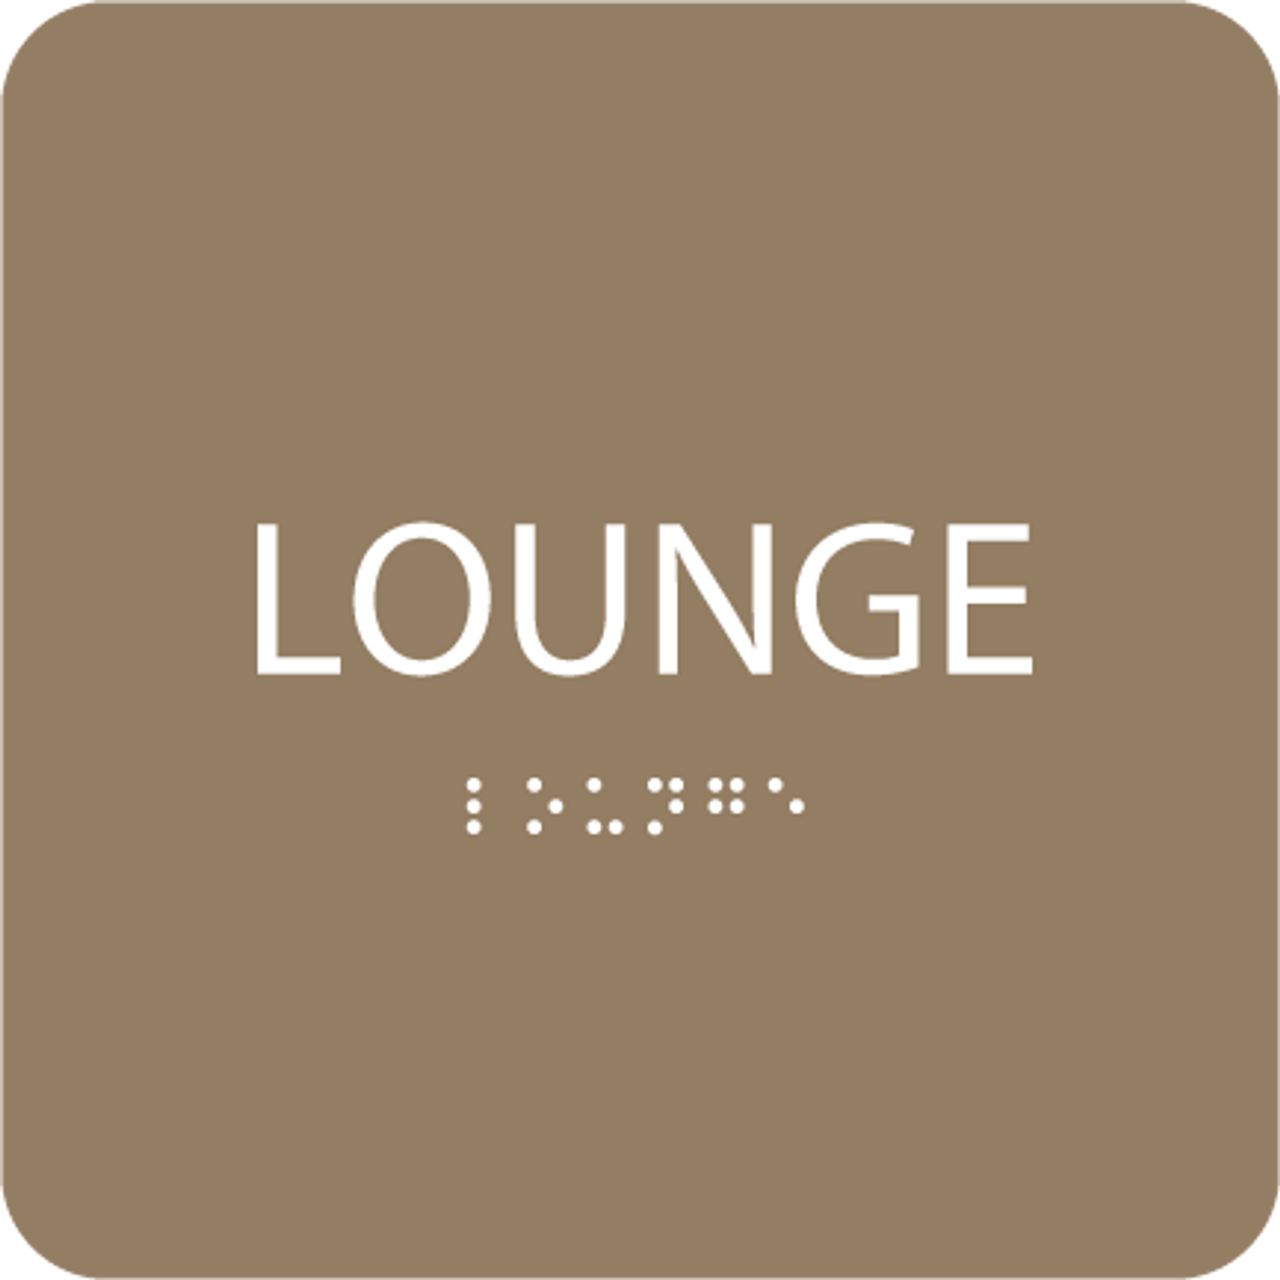 Brown Lounge ADA Sign